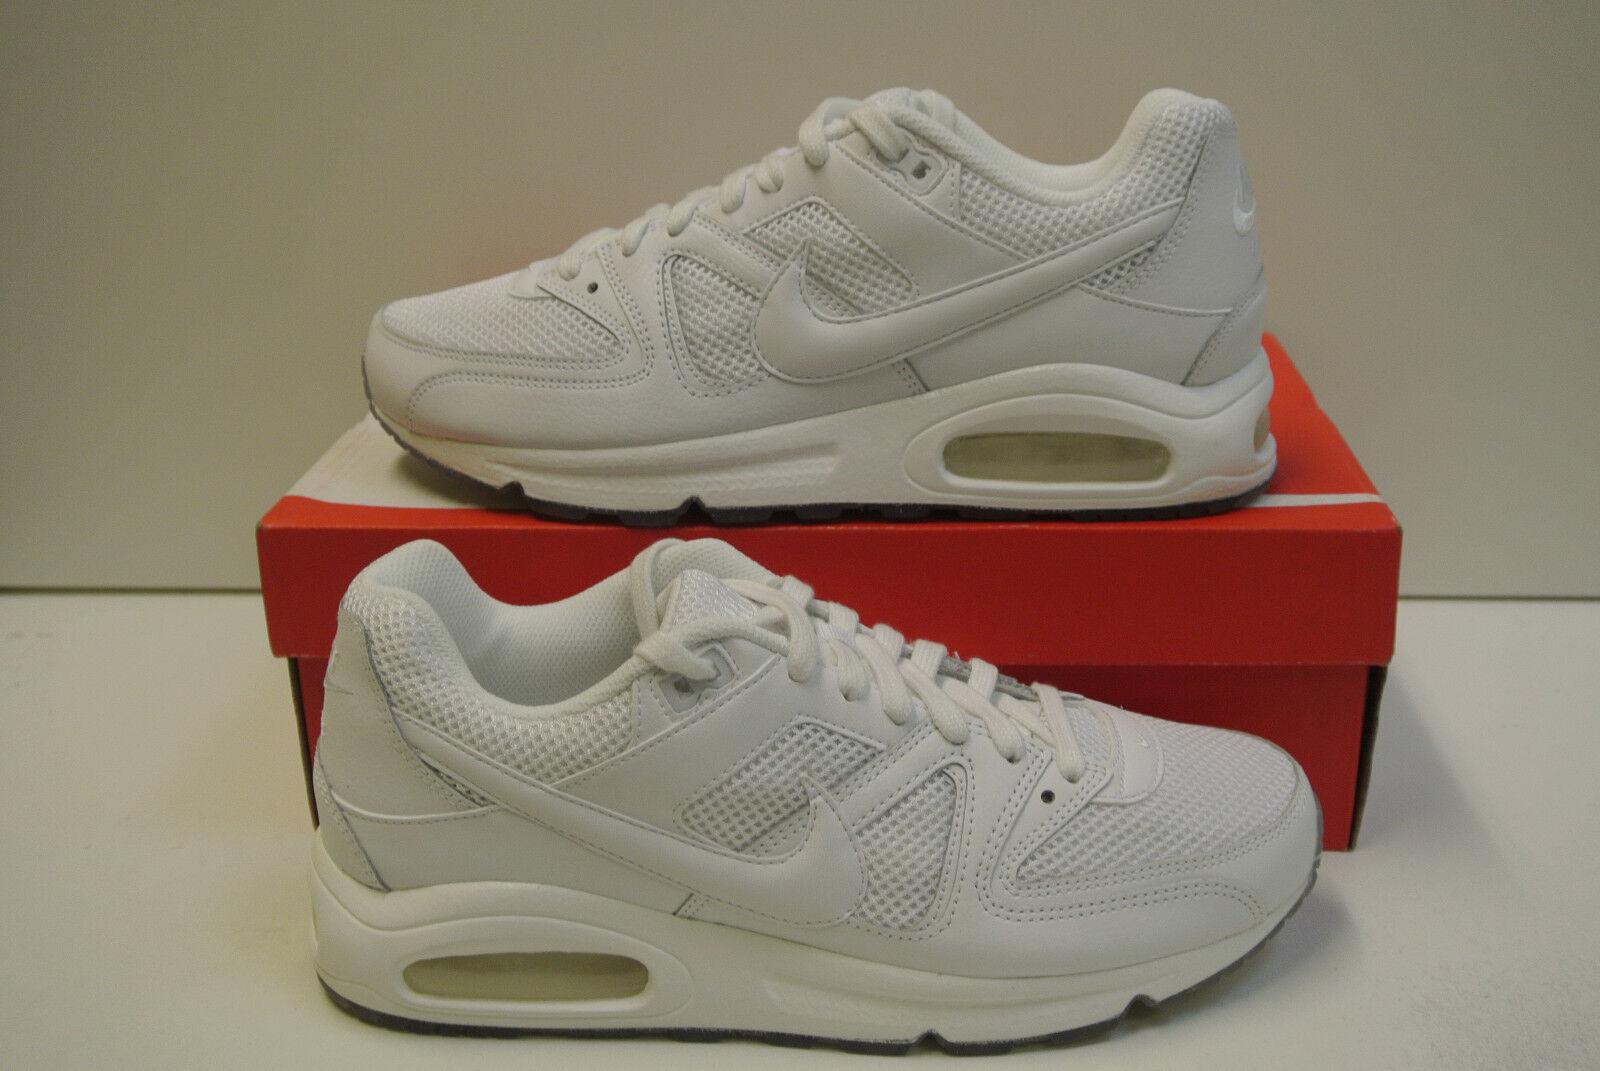 Nike Air Max Command  Gr. wählbar Neu & OVP 629993 112